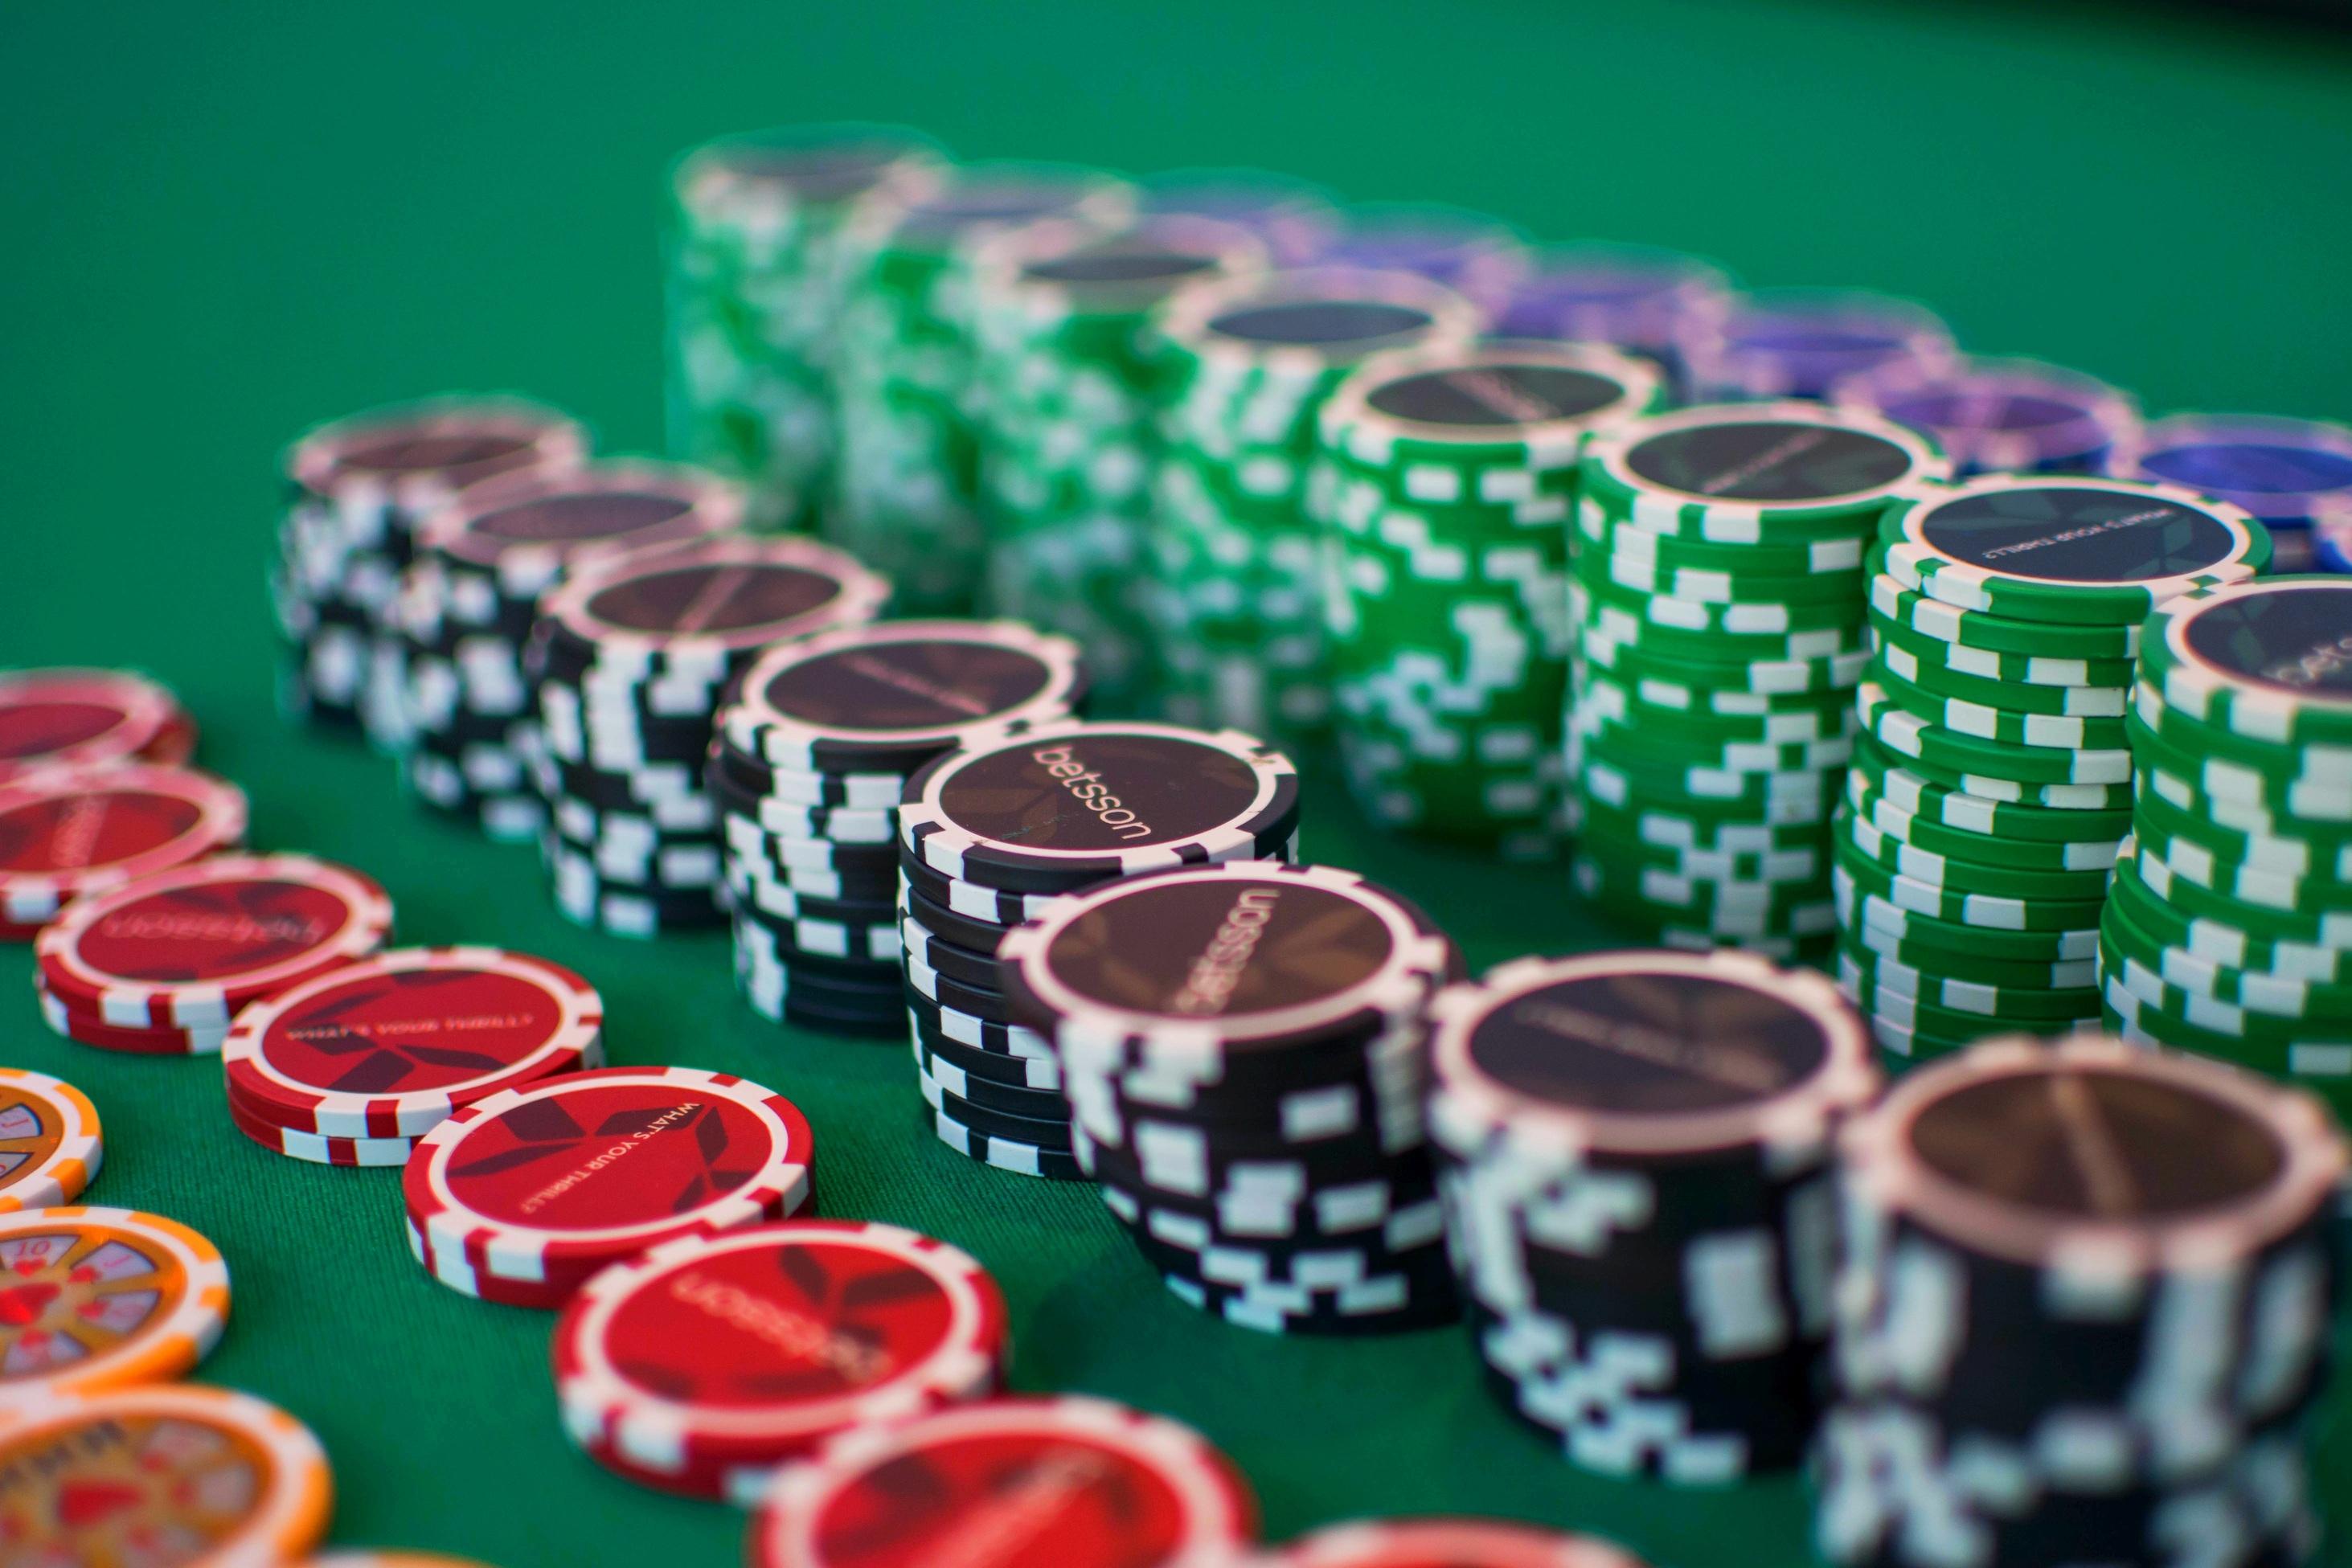 How to start a sports gambling website